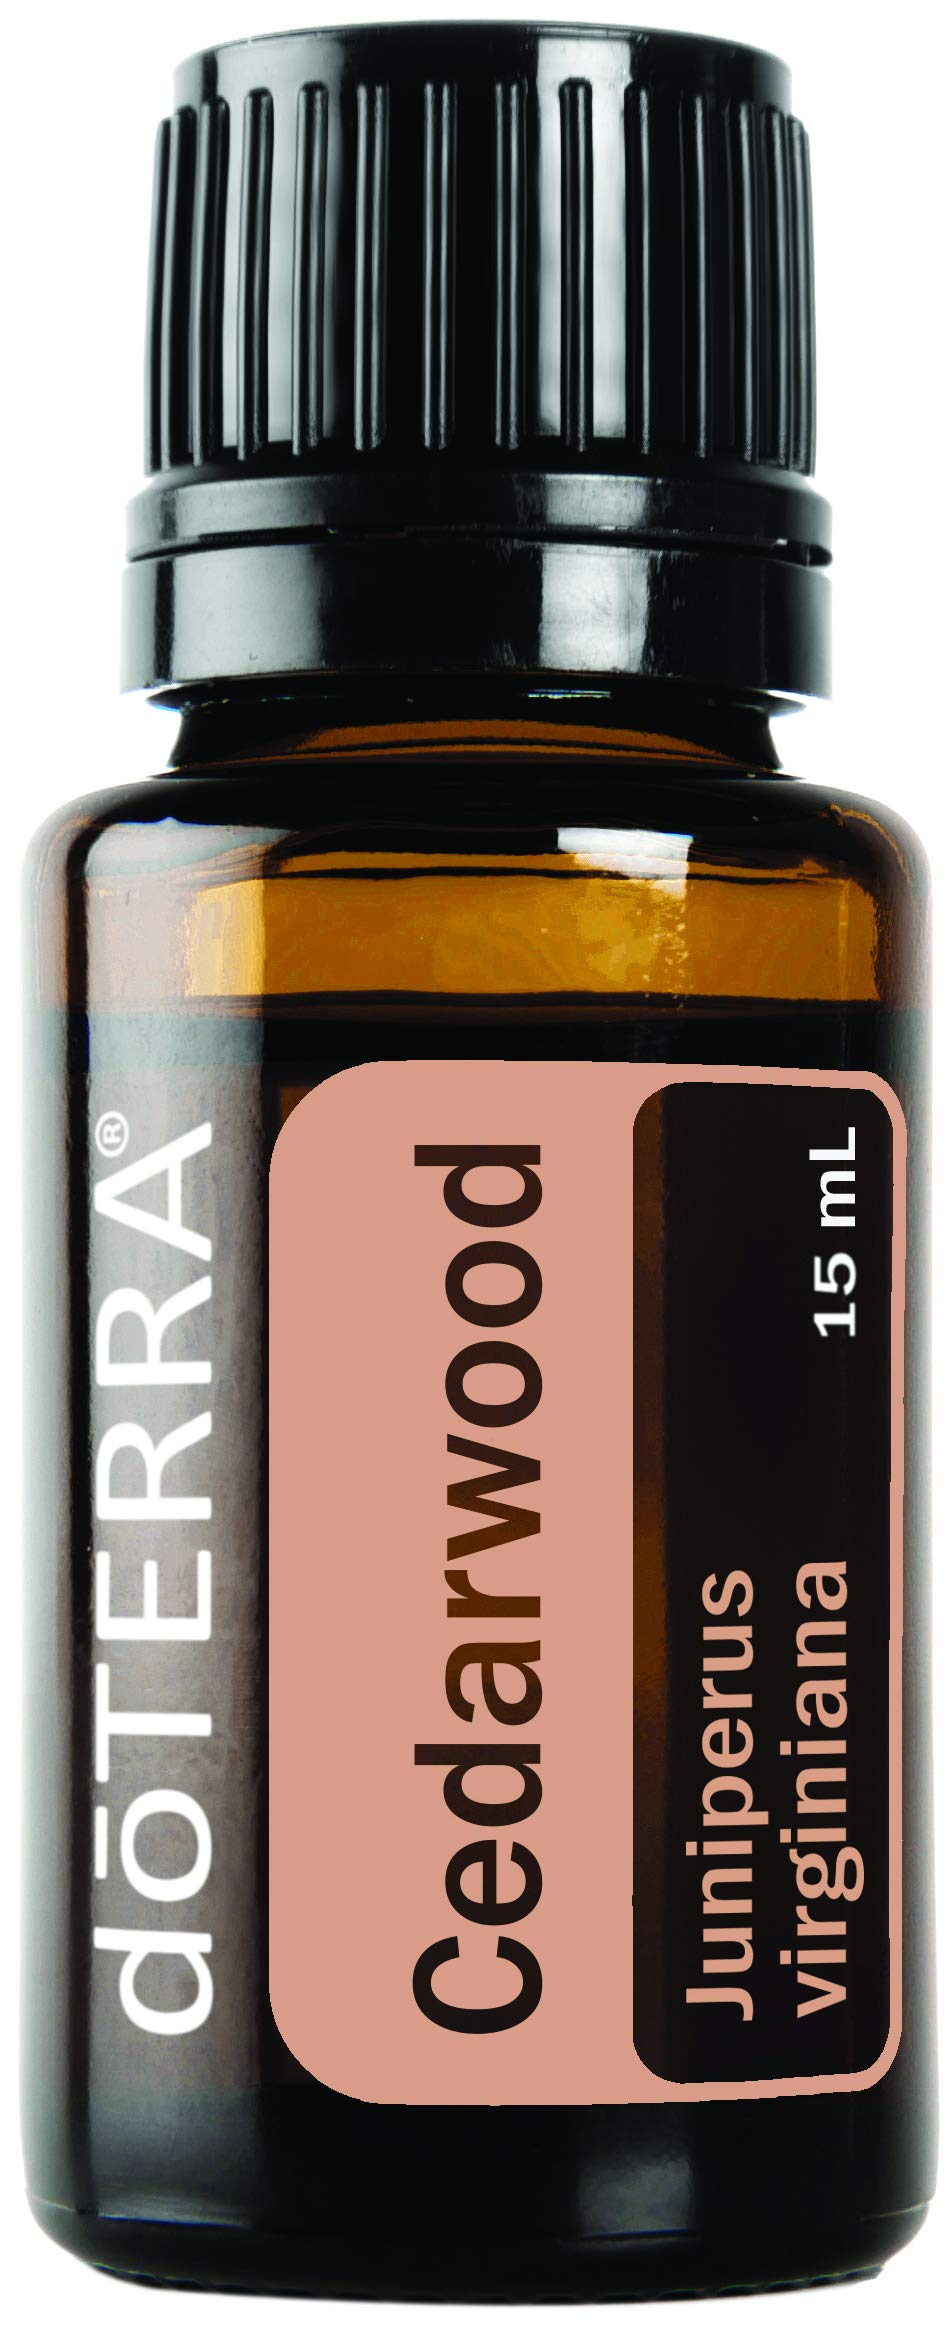 doTERRA - Cedarwood Essential Oil - 15 mL